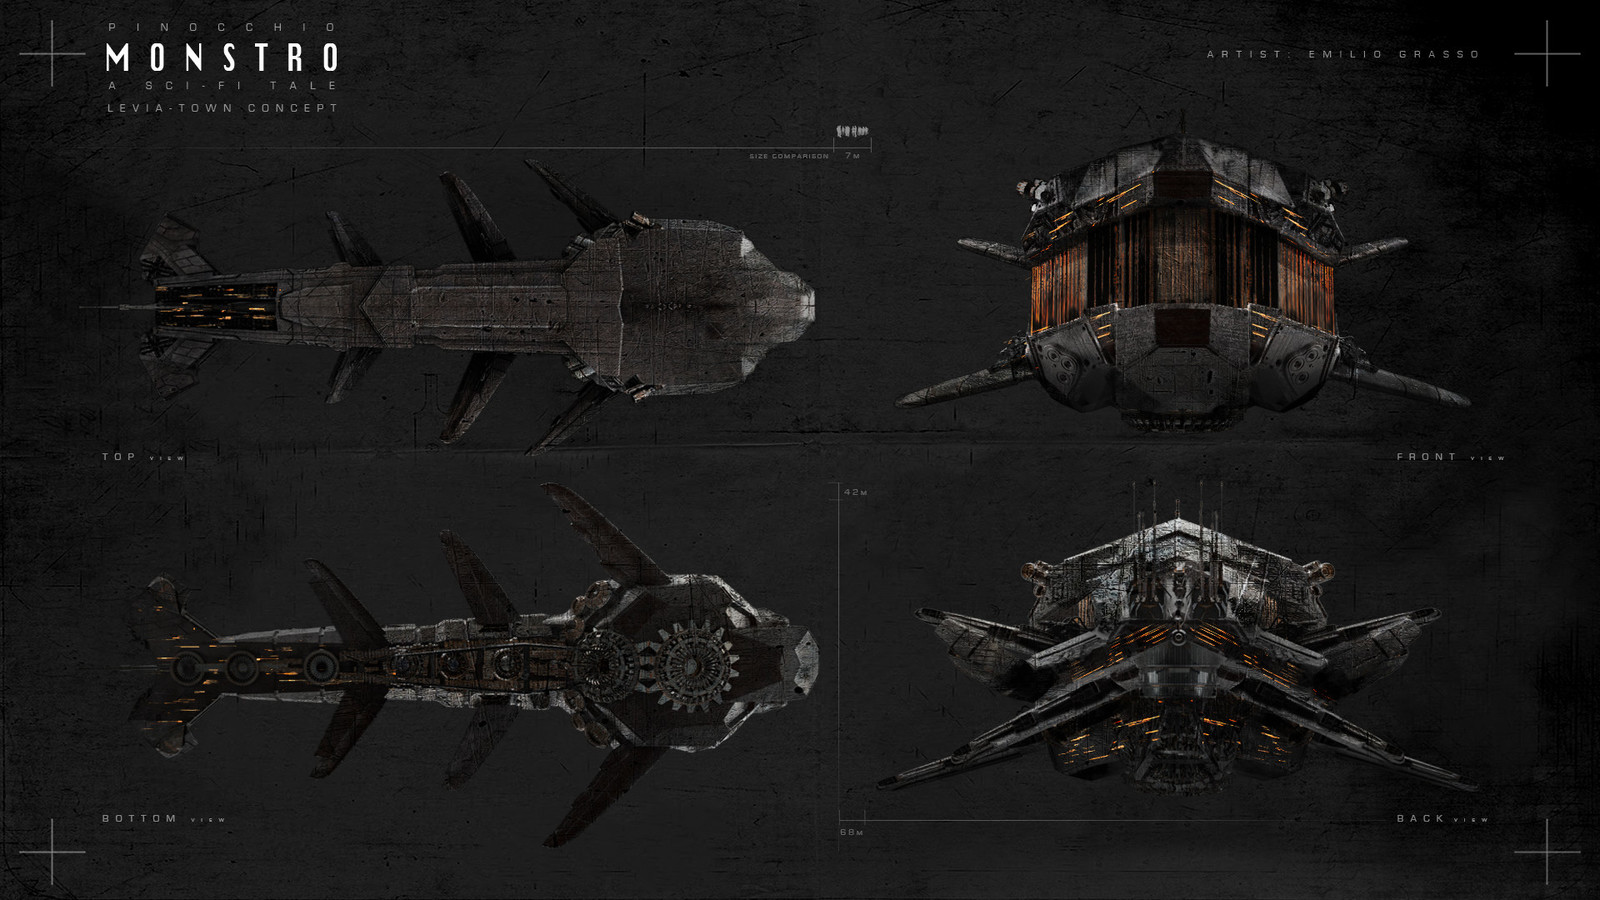 PIN:0Q0 - Monstro SS Concept #2